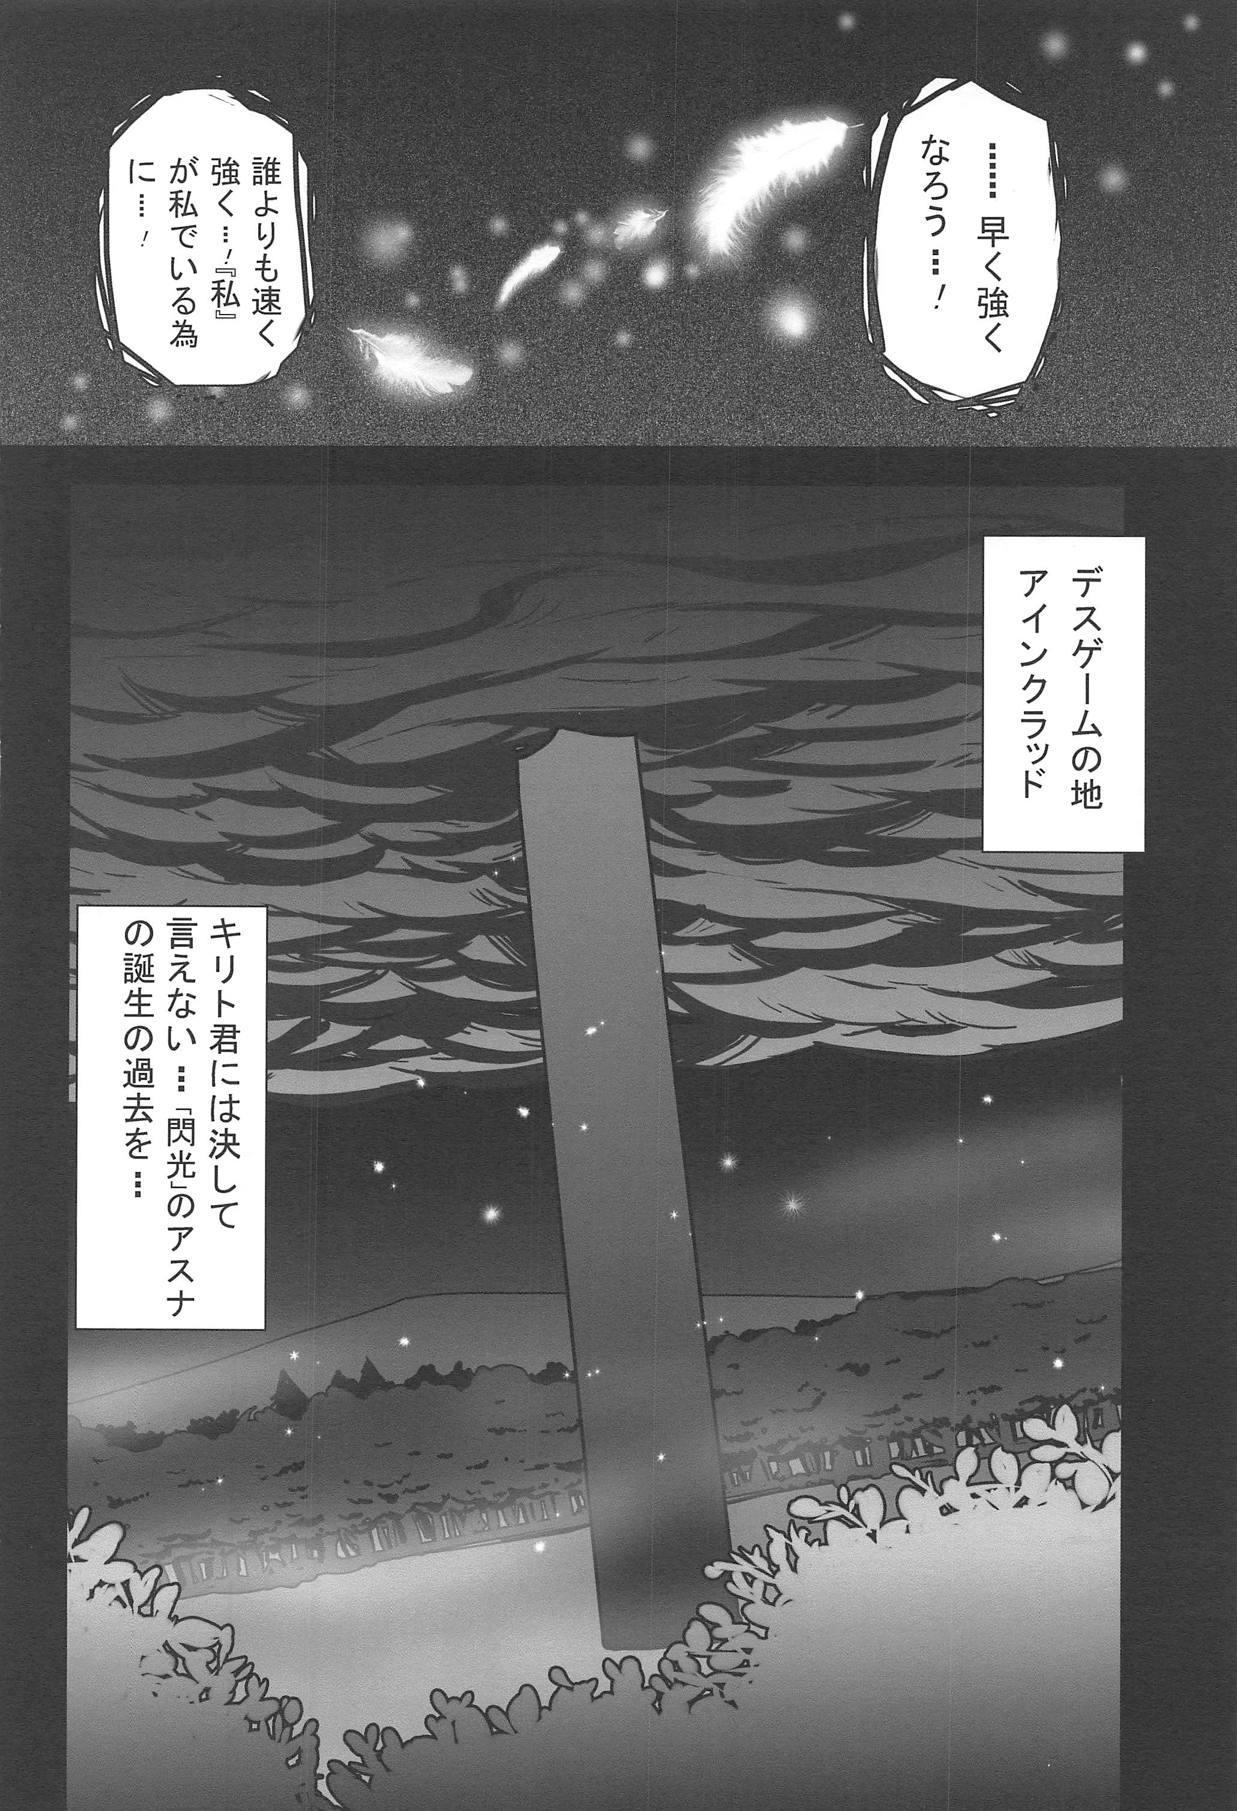 (C95) [TRAP (Urano Mami)] SAO ~sokoni anatato omoideto~ ETERNAL (Sword Art Online) 14